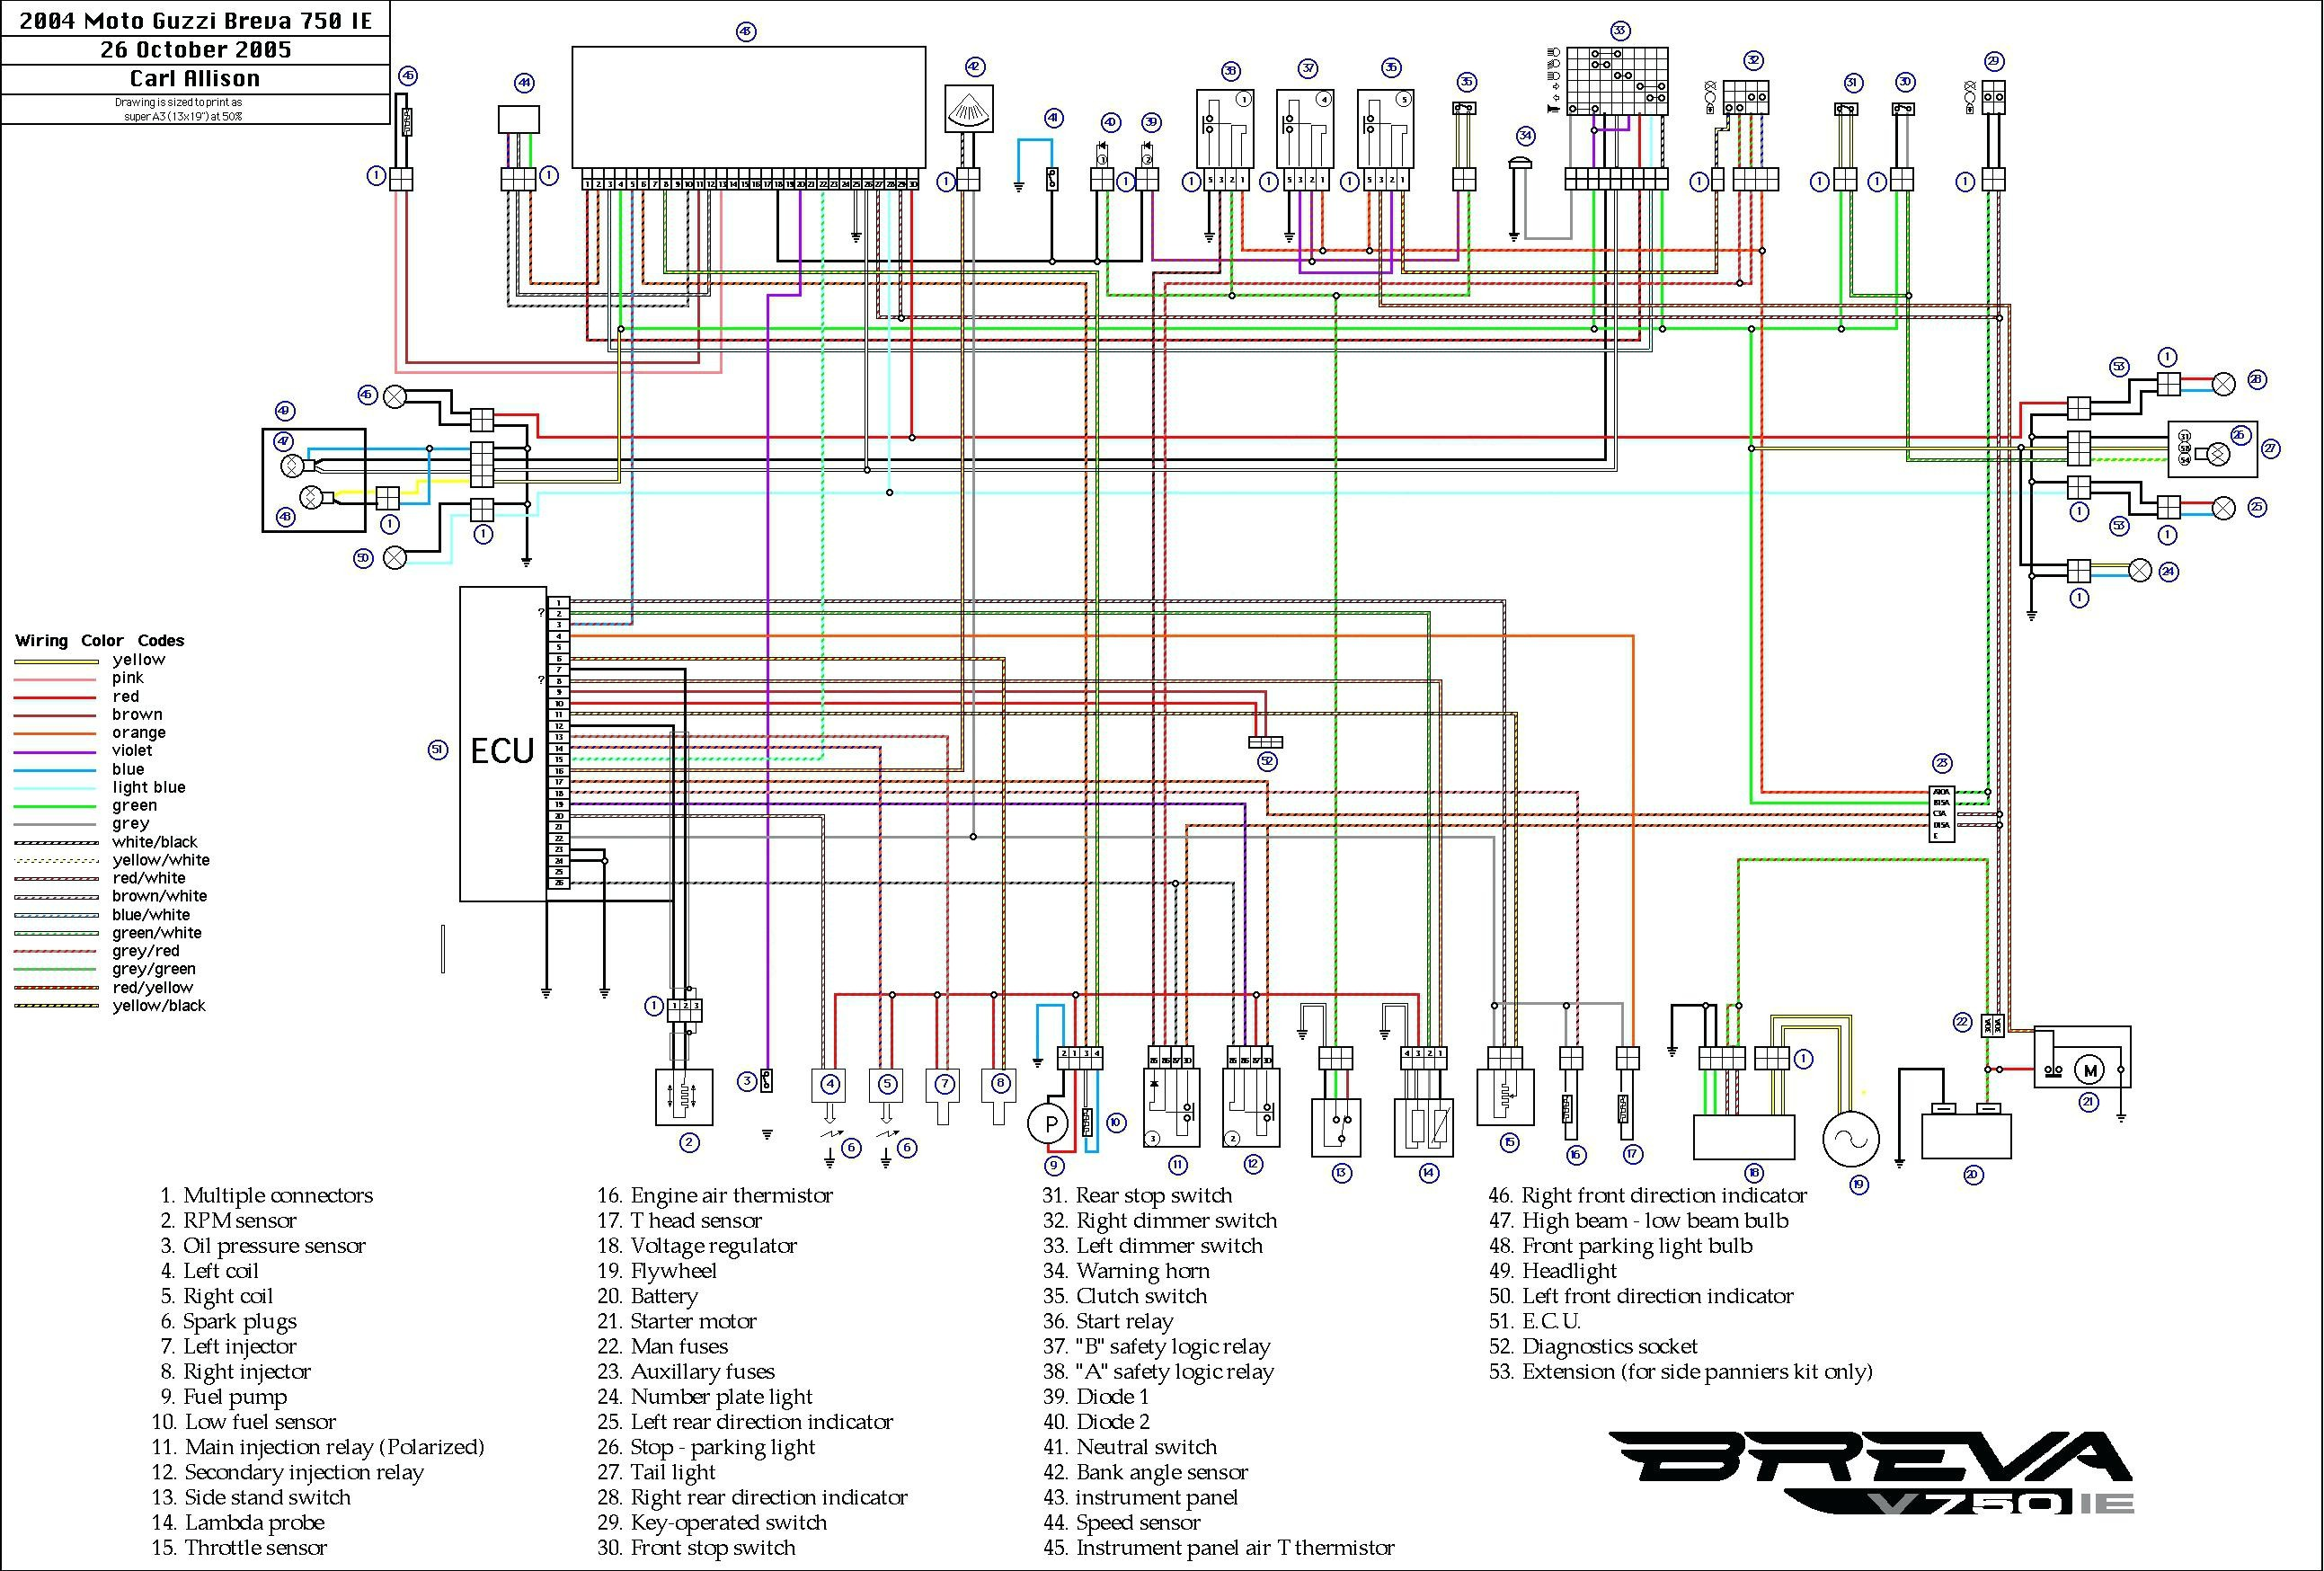 Chrysler Pacifica Engine Diagram Motor Mount 3 8 Circuit Maker Line Wiring Dodge Ram Fresh Of